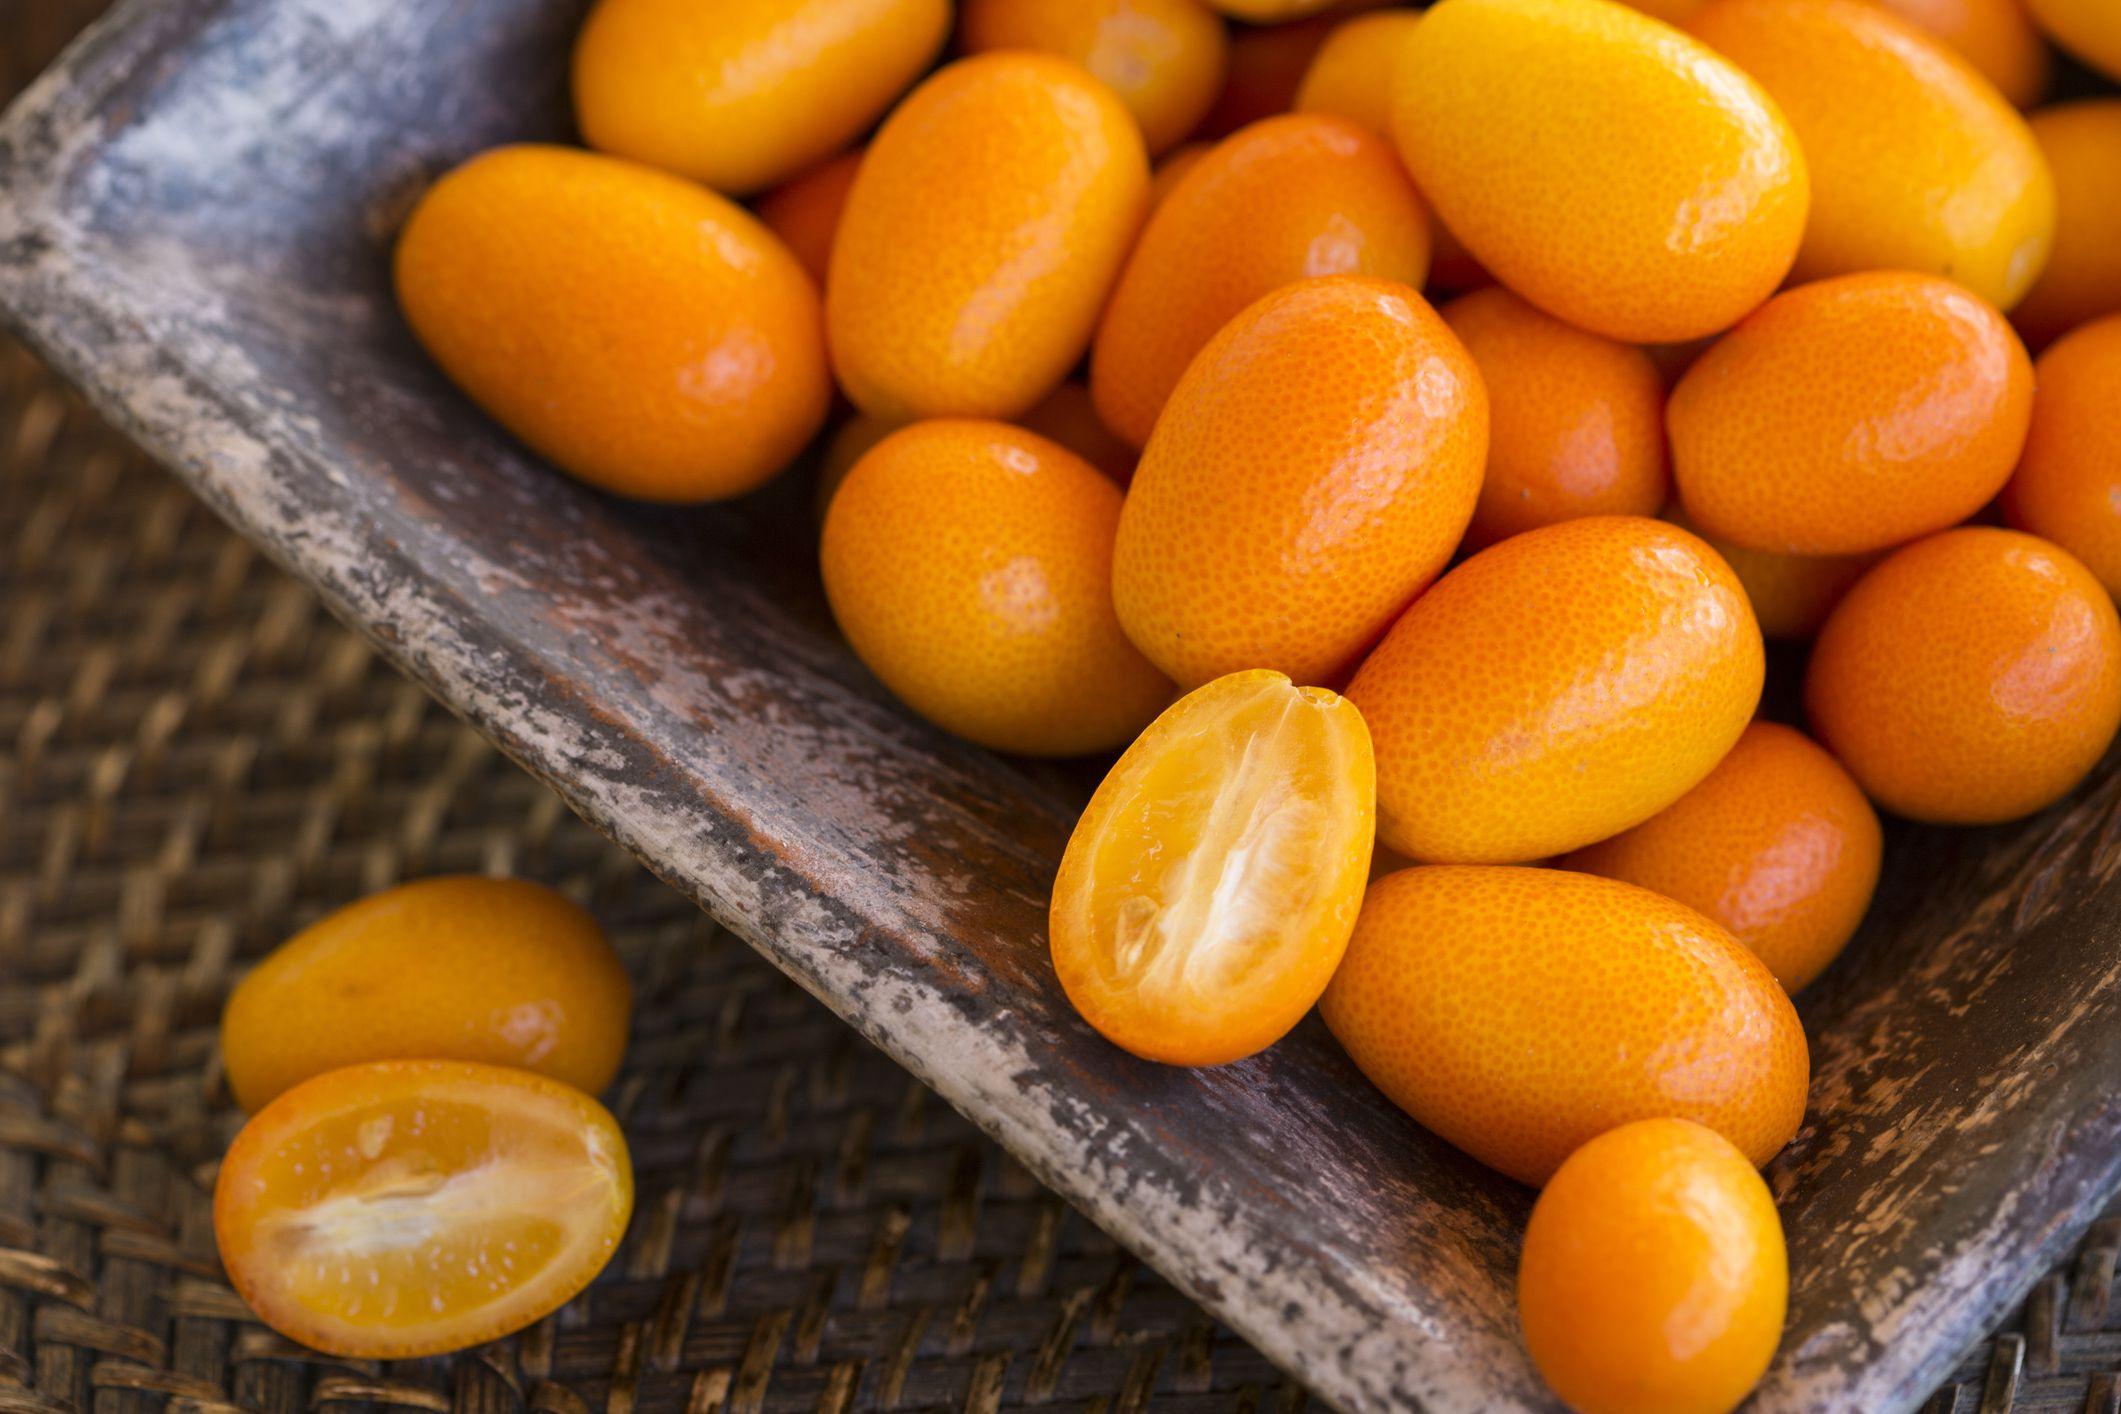 Tiny Bathroom Decorating Ideas Great Ways To Use Kumquats 7 Tasty Kumquat Recipes